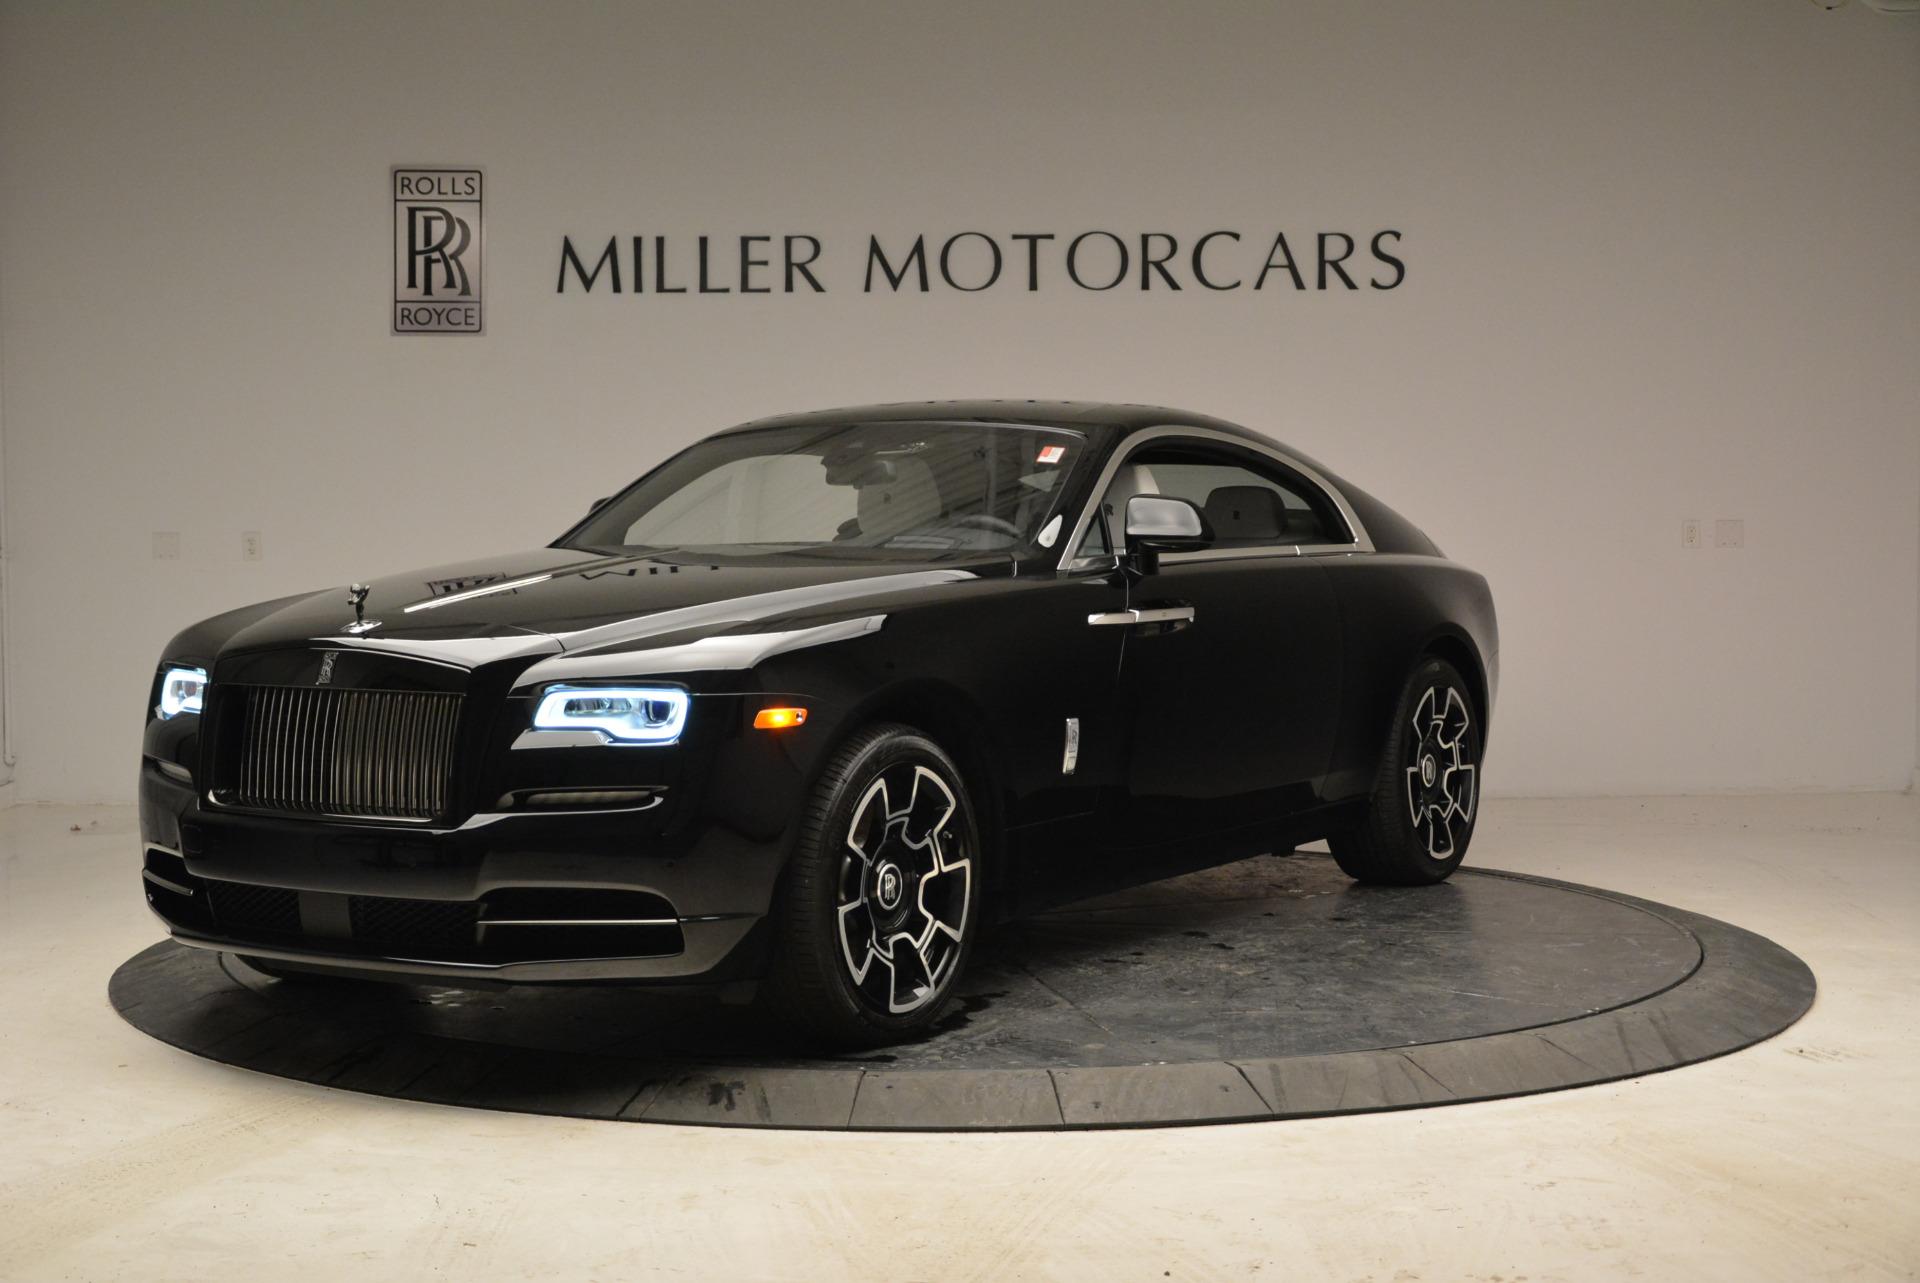 Used 2017 Rolls-Royce Wraith Black Badge for sale Sold at Alfa Romeo of Westport in Westport CT 06880 1